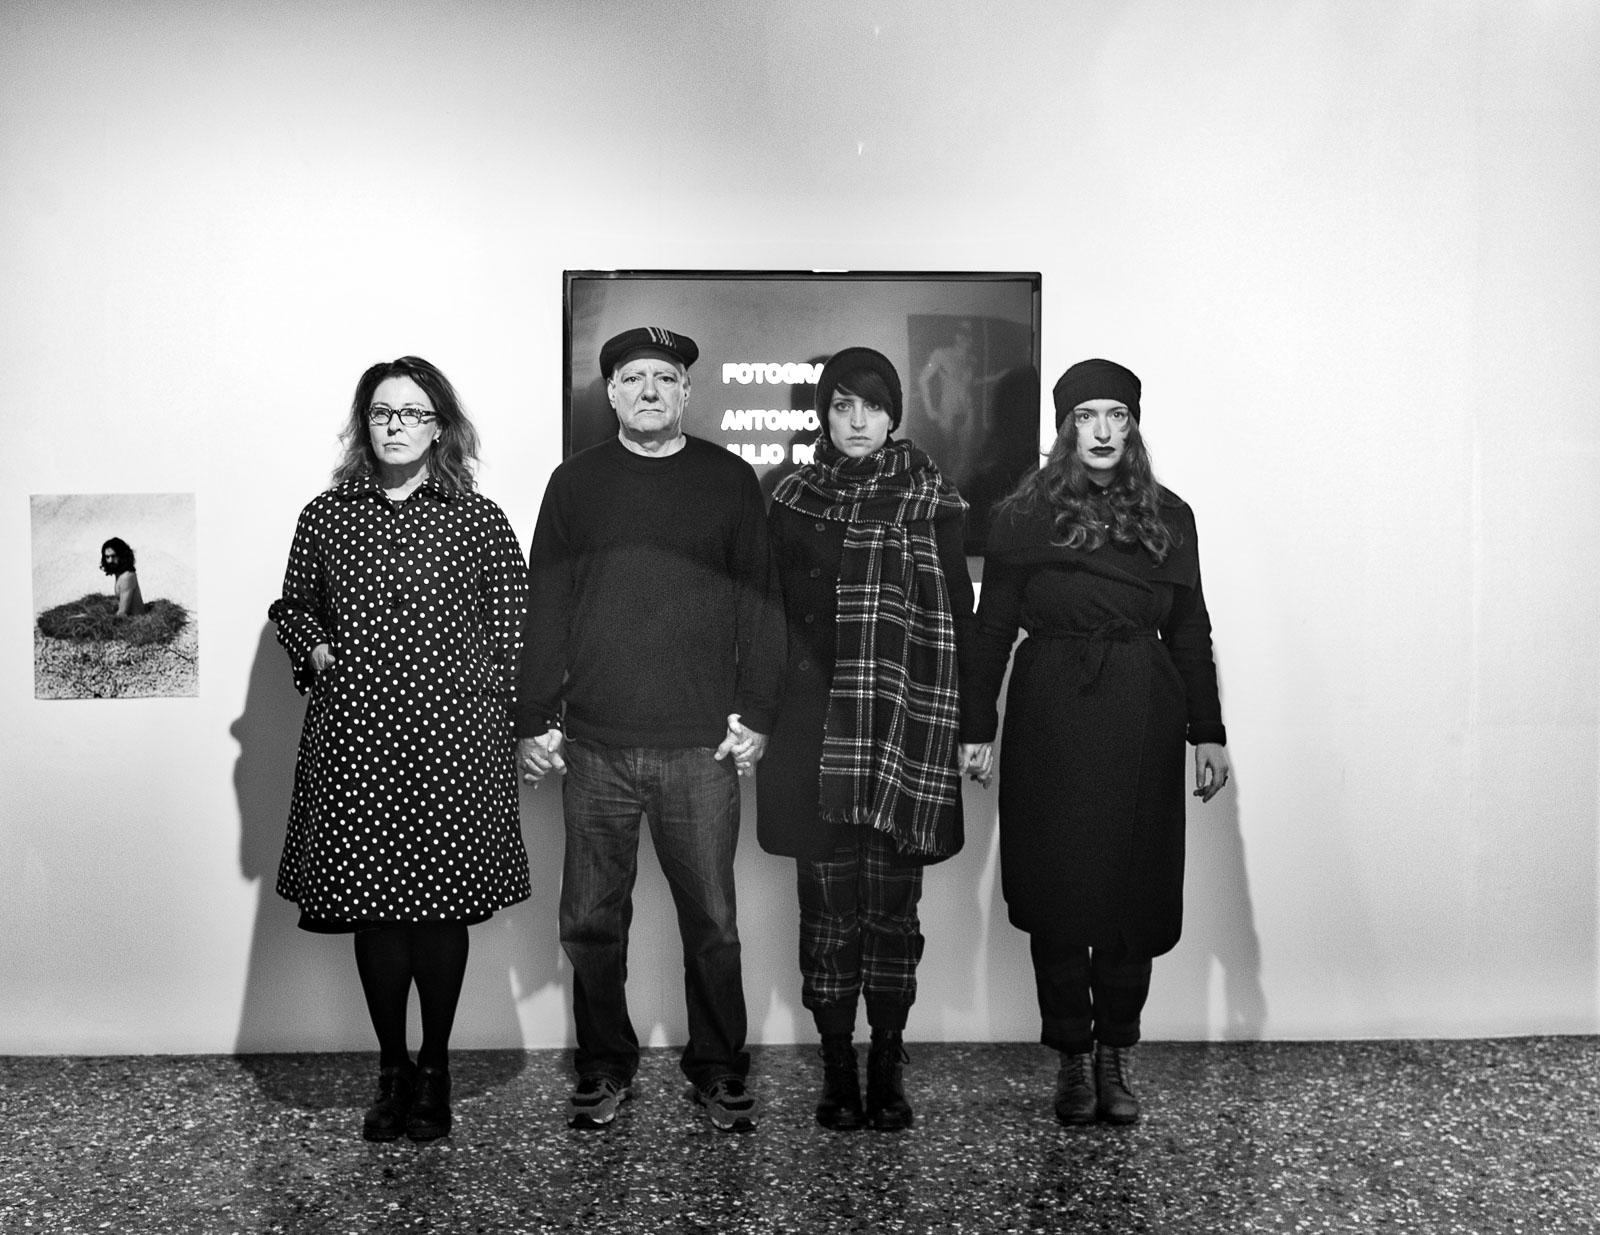 With Marisa Abate (left), Cristiana Zeta Rolla and Francesca Carol Rolla